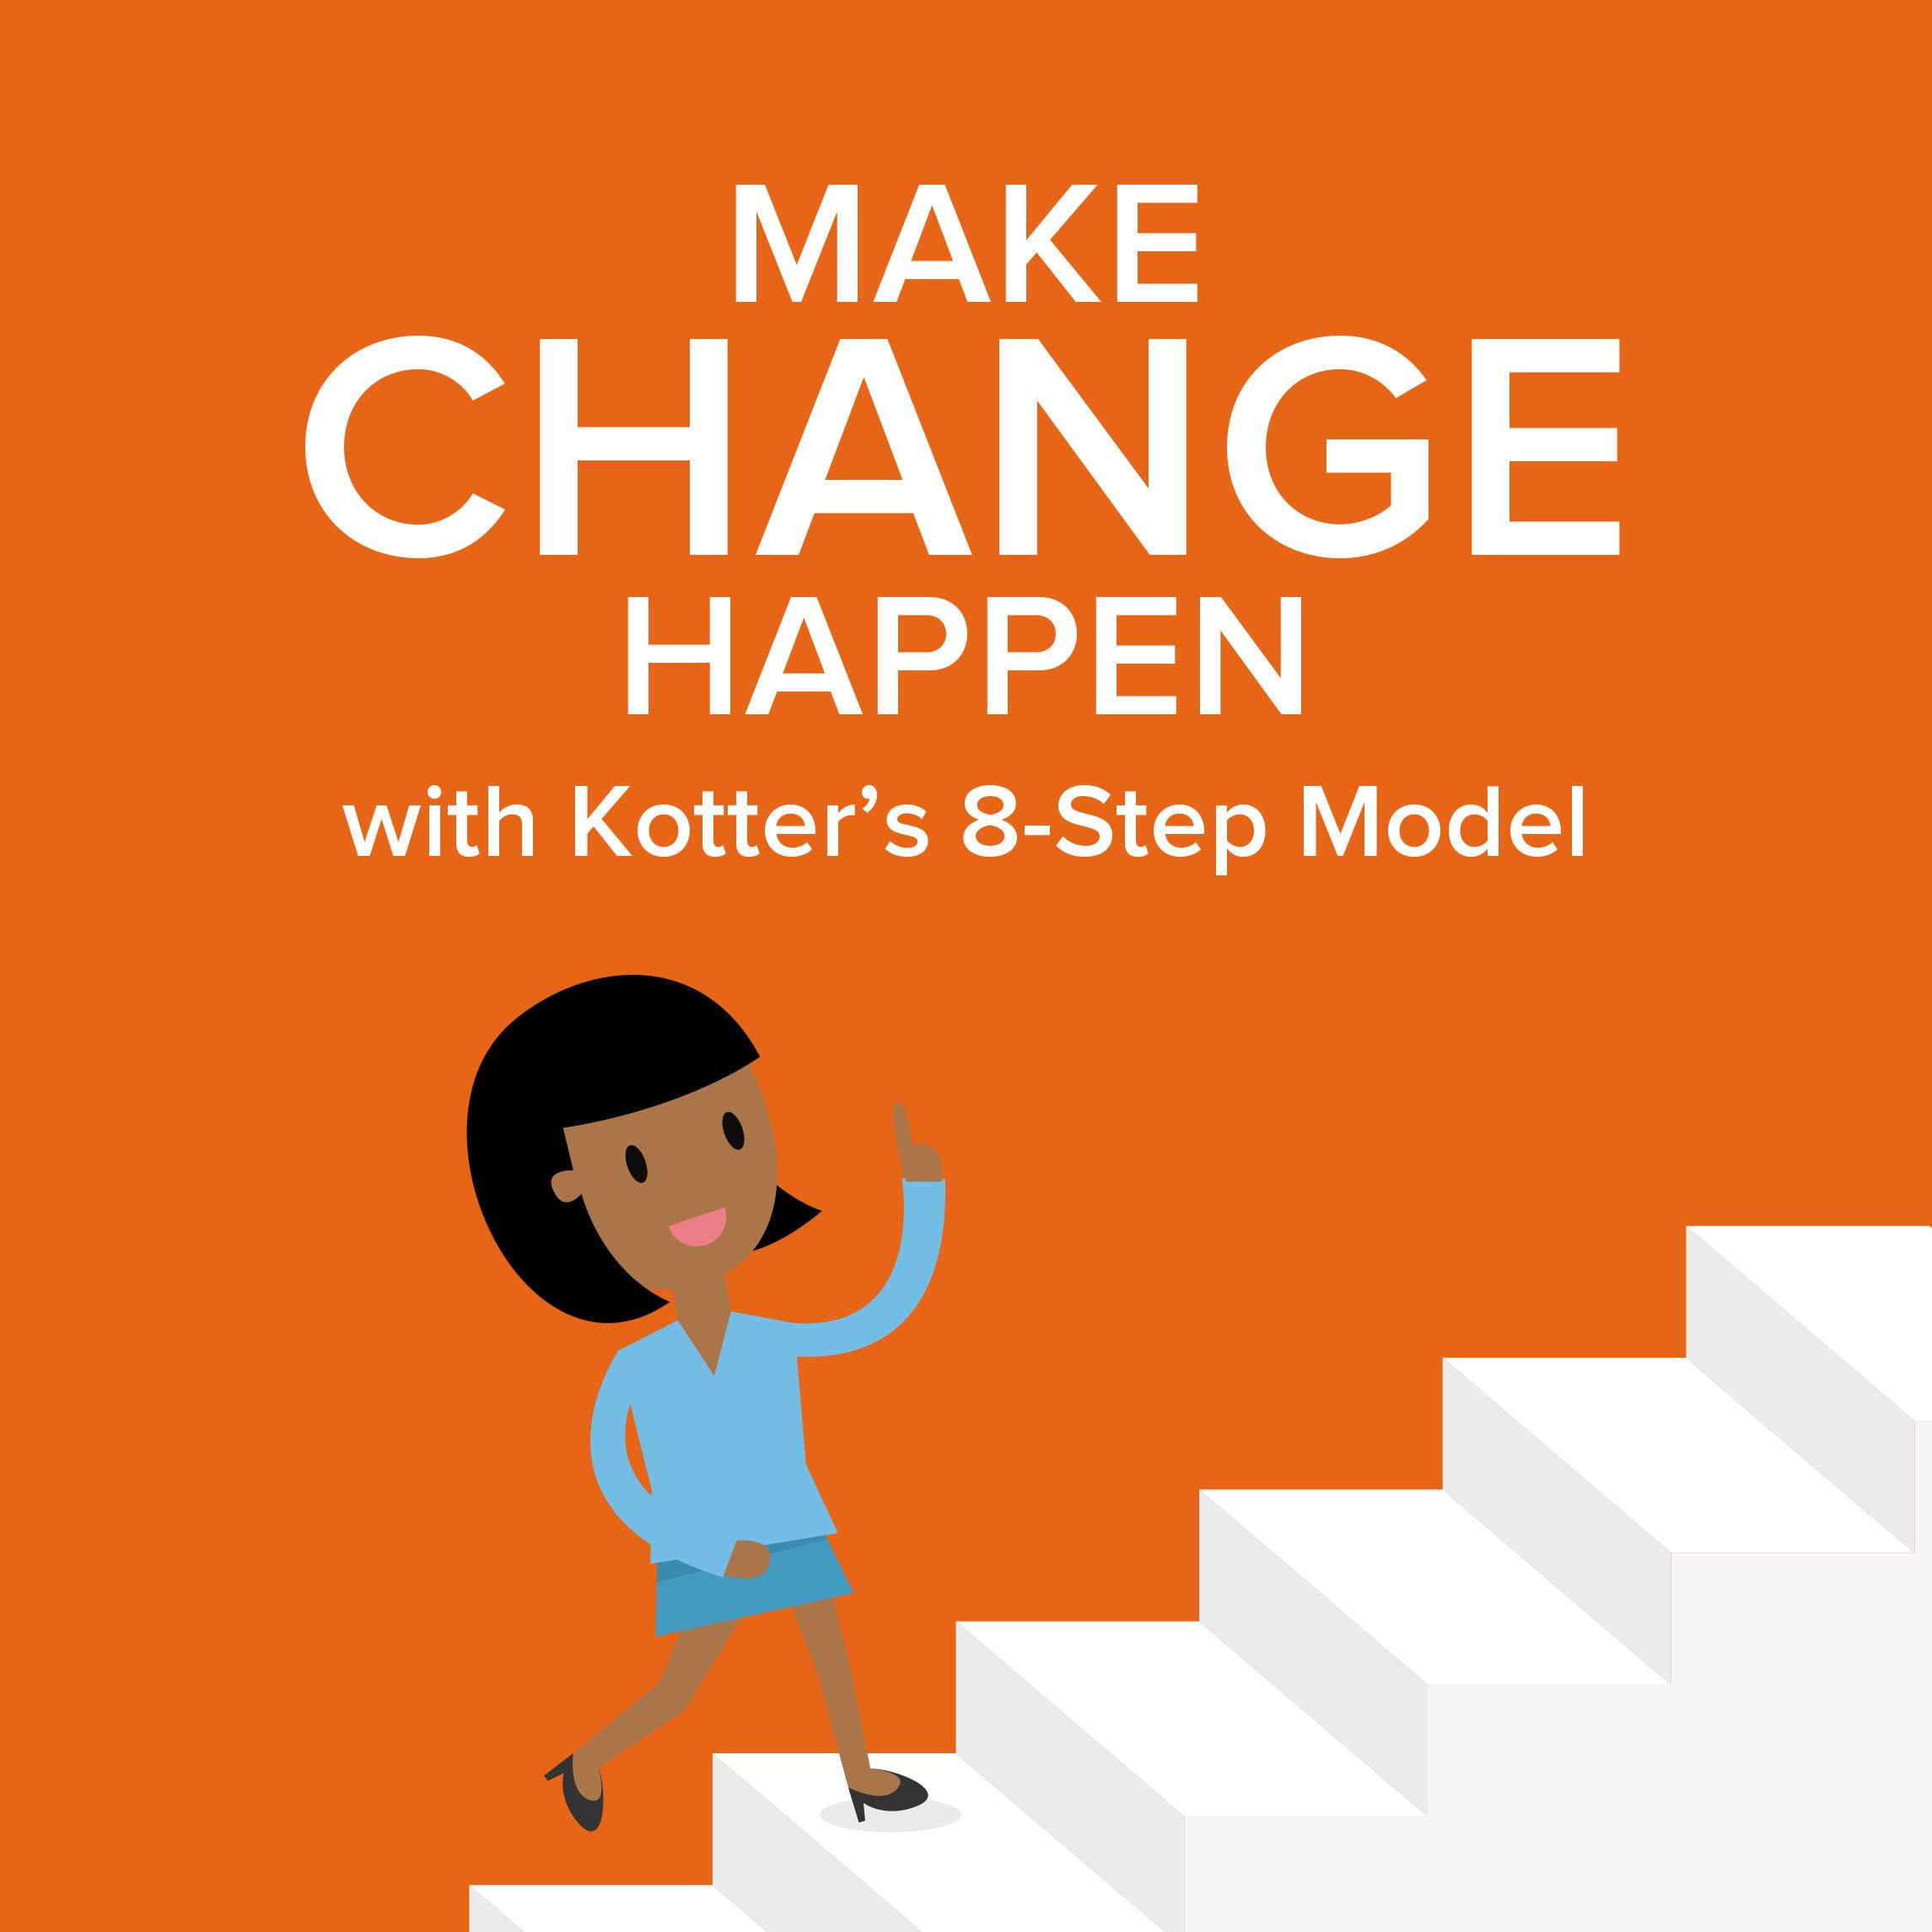 kotters 8 step model V3_1x1